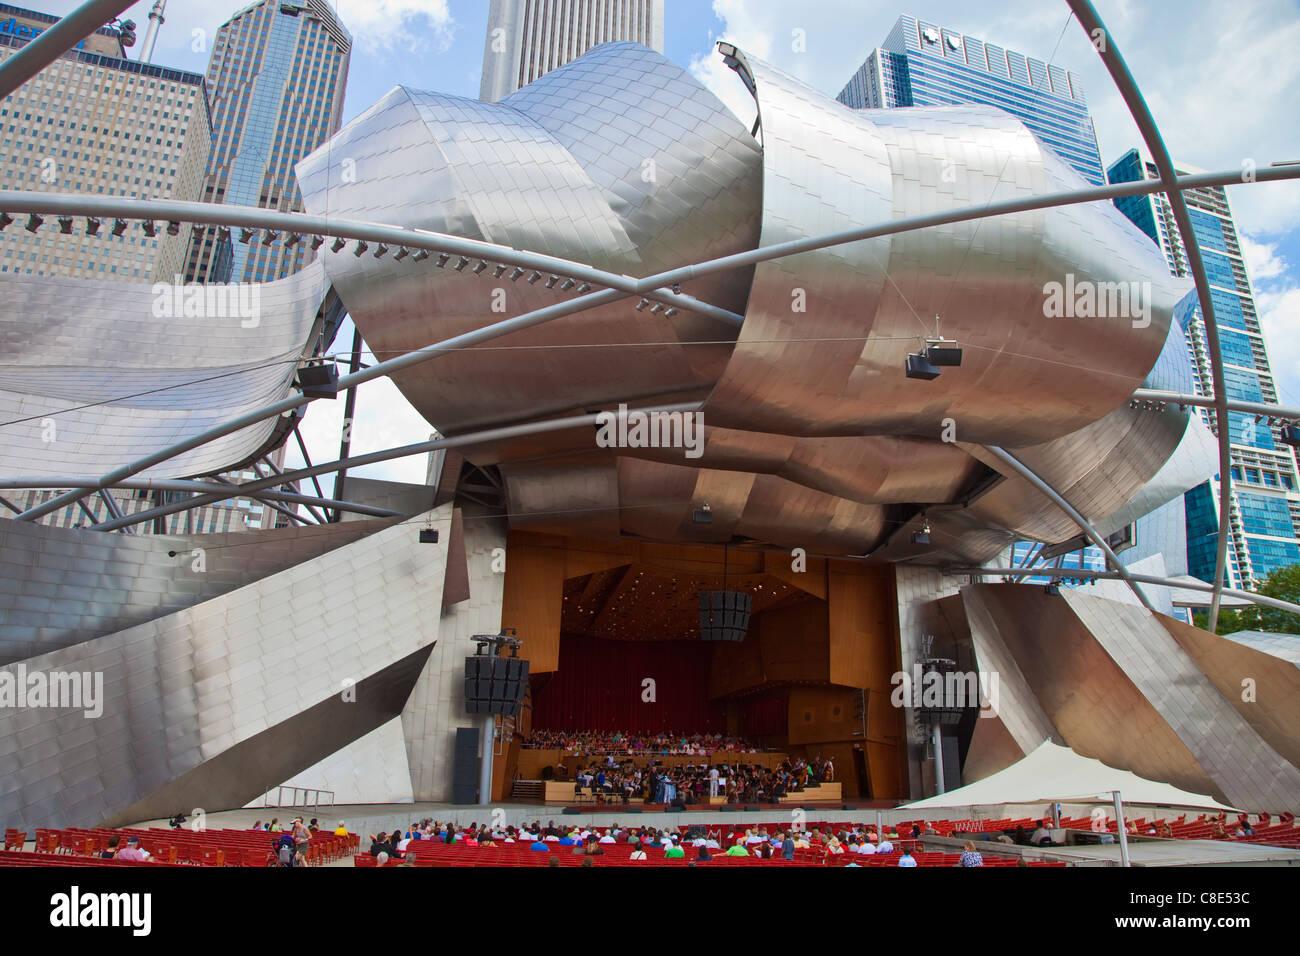 Jay Pritzker Pavilion designed by Frank Gehry, Millennium Park, Chicago, IL, USA - Stock Image